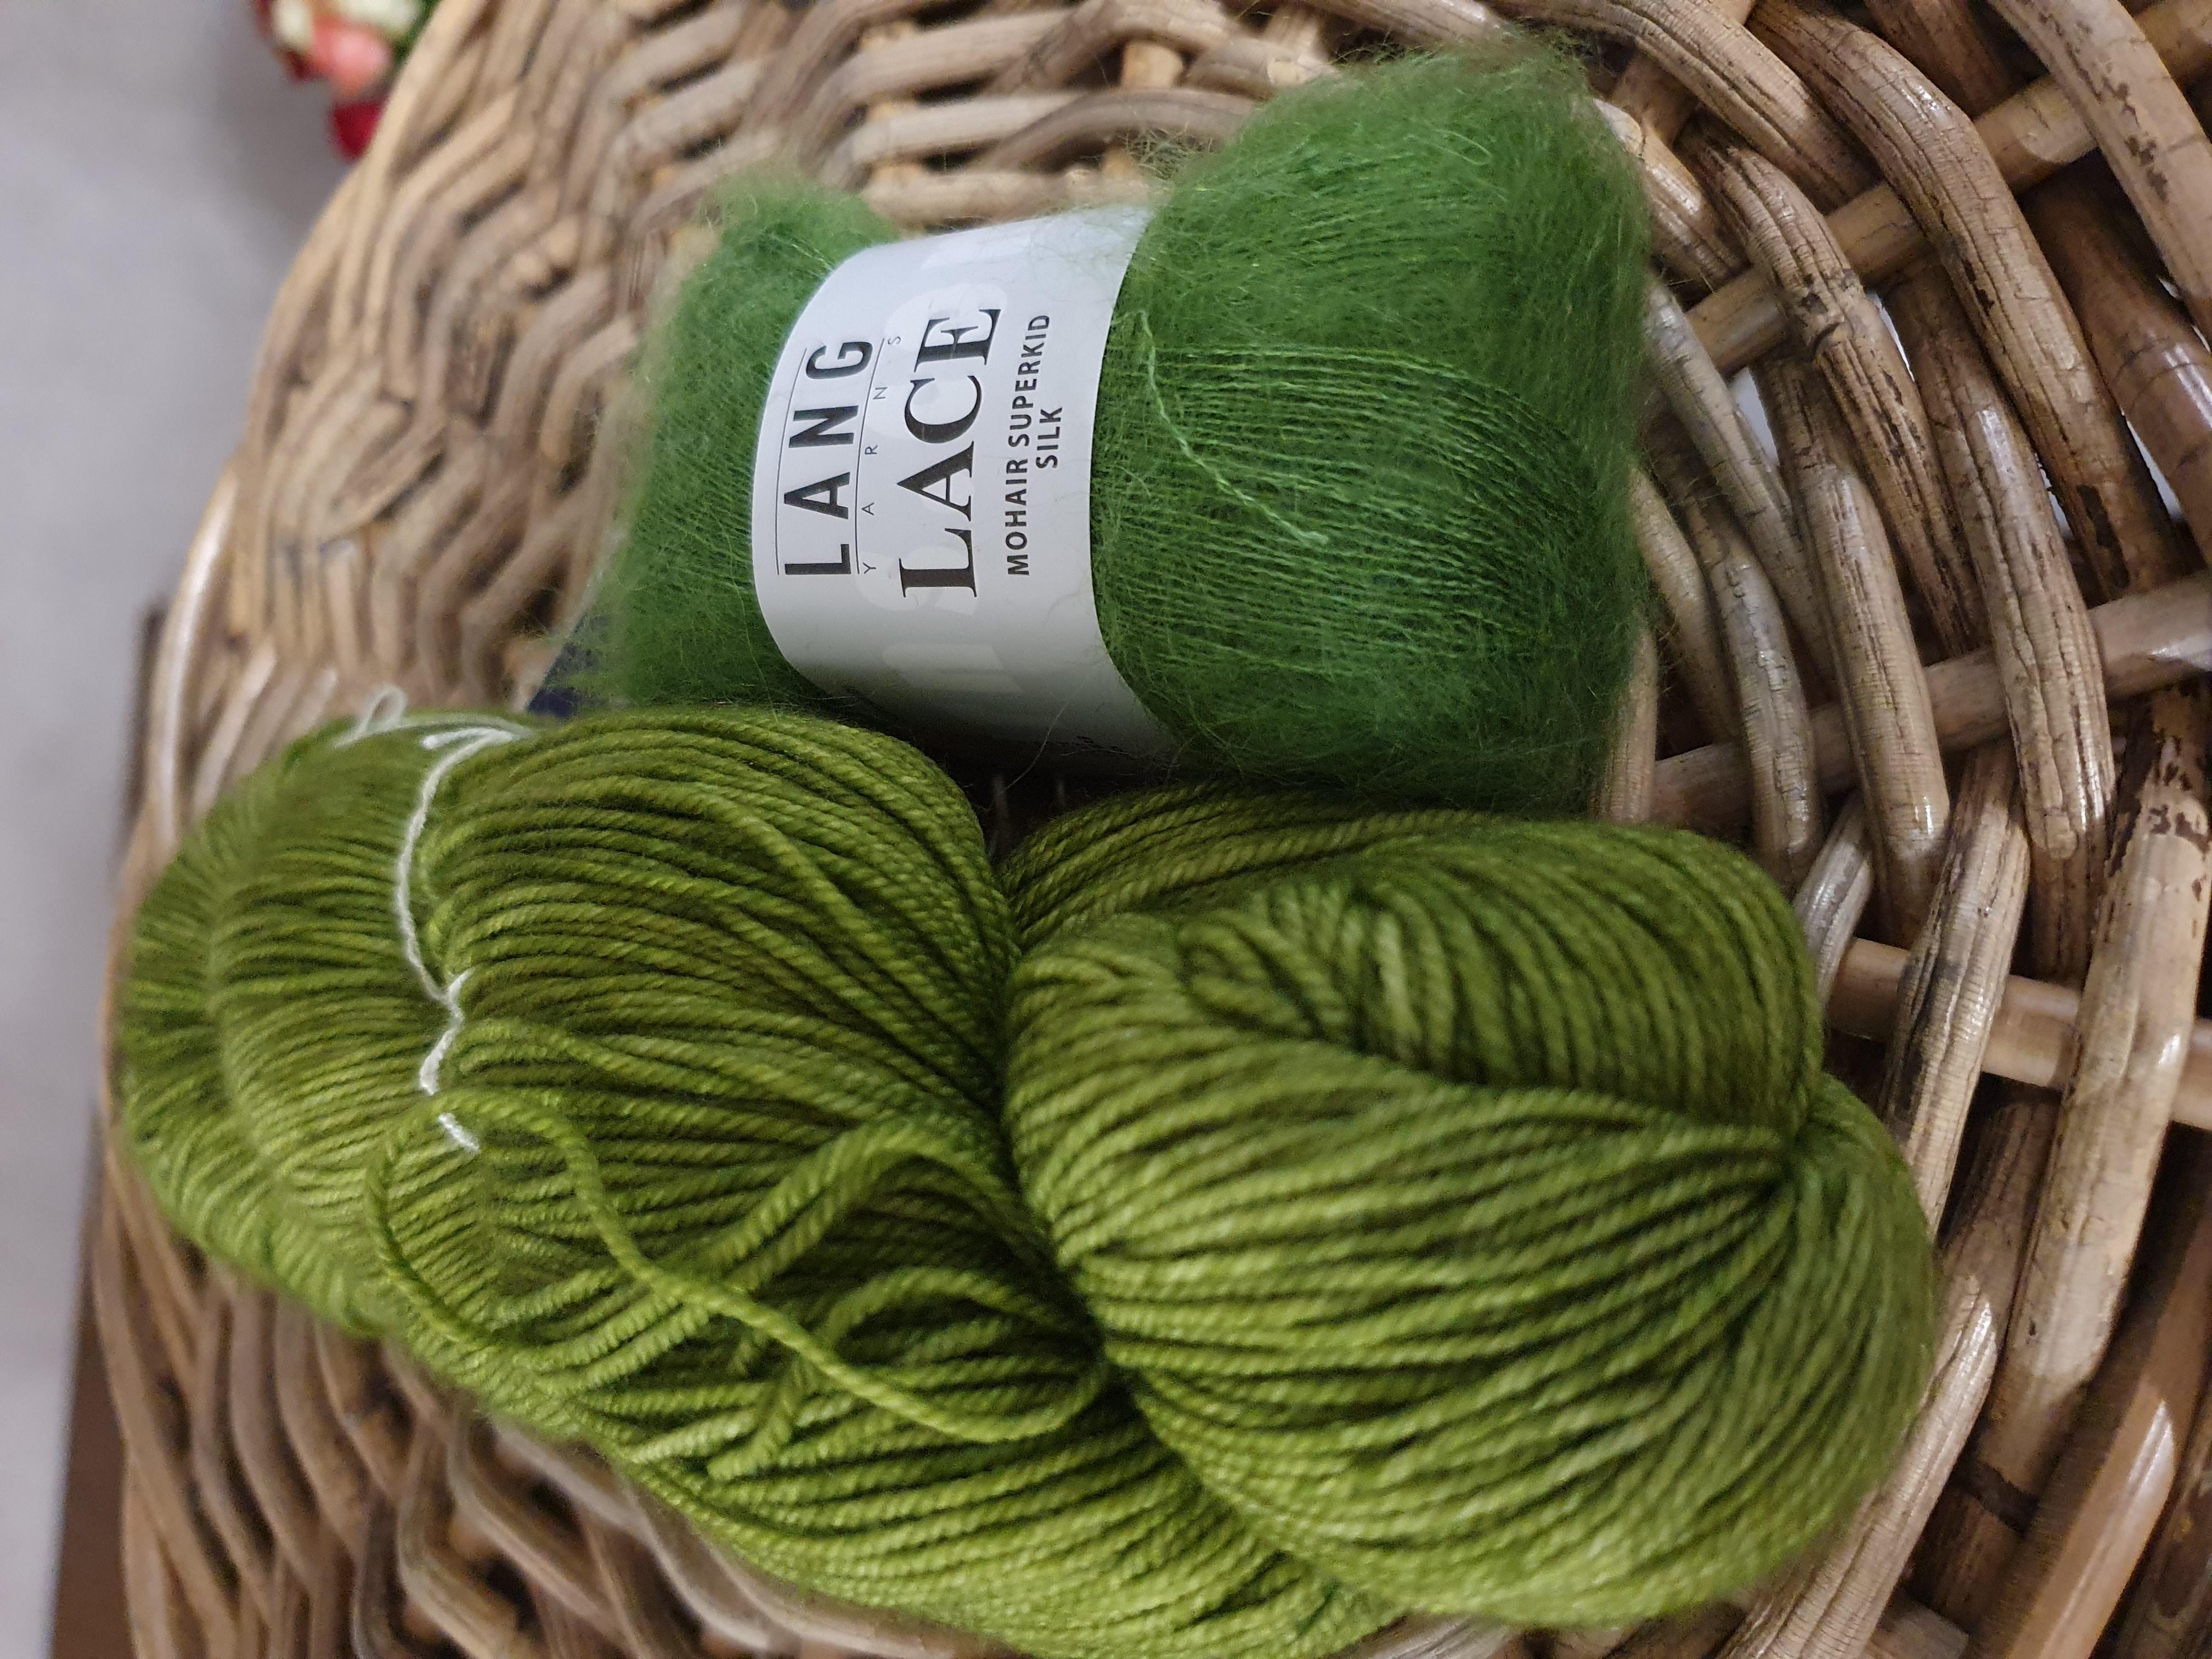 Malabrigo sock ja Lang yarns lace